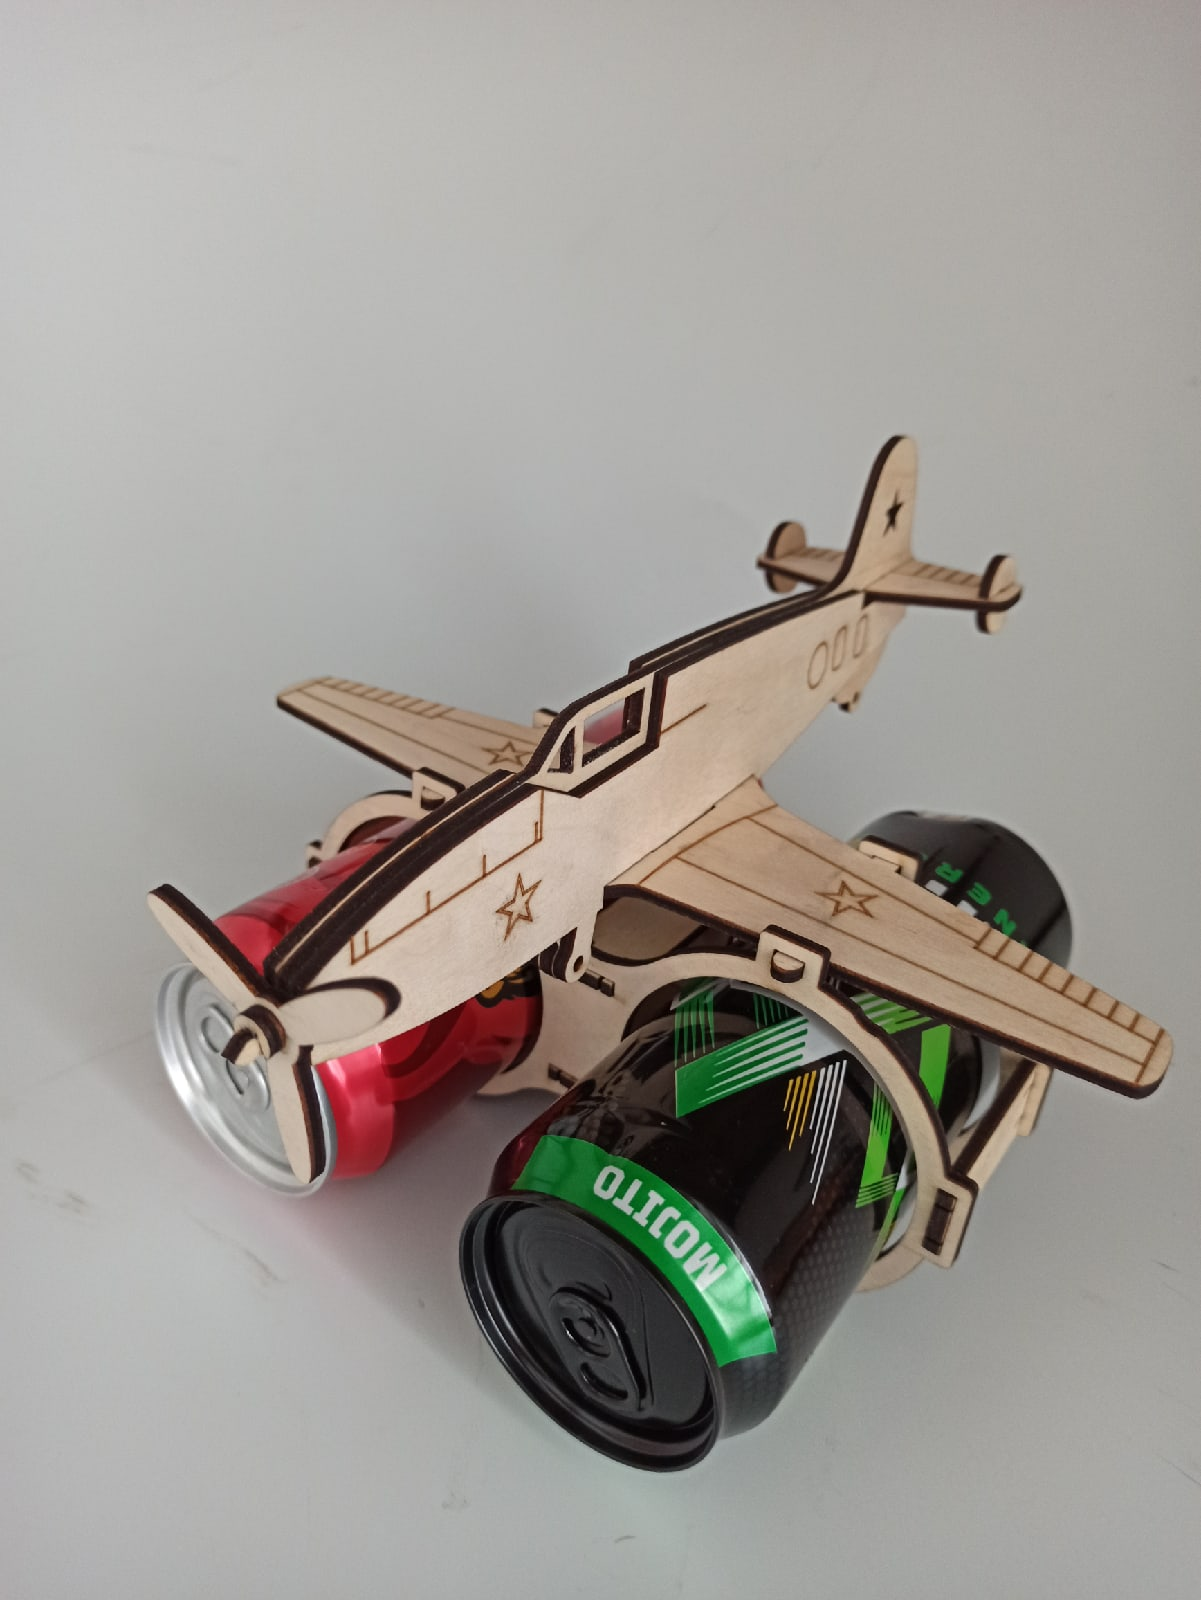 Laser Cut Aircraft Shaped Beer Holder Free CDR Vectors Art